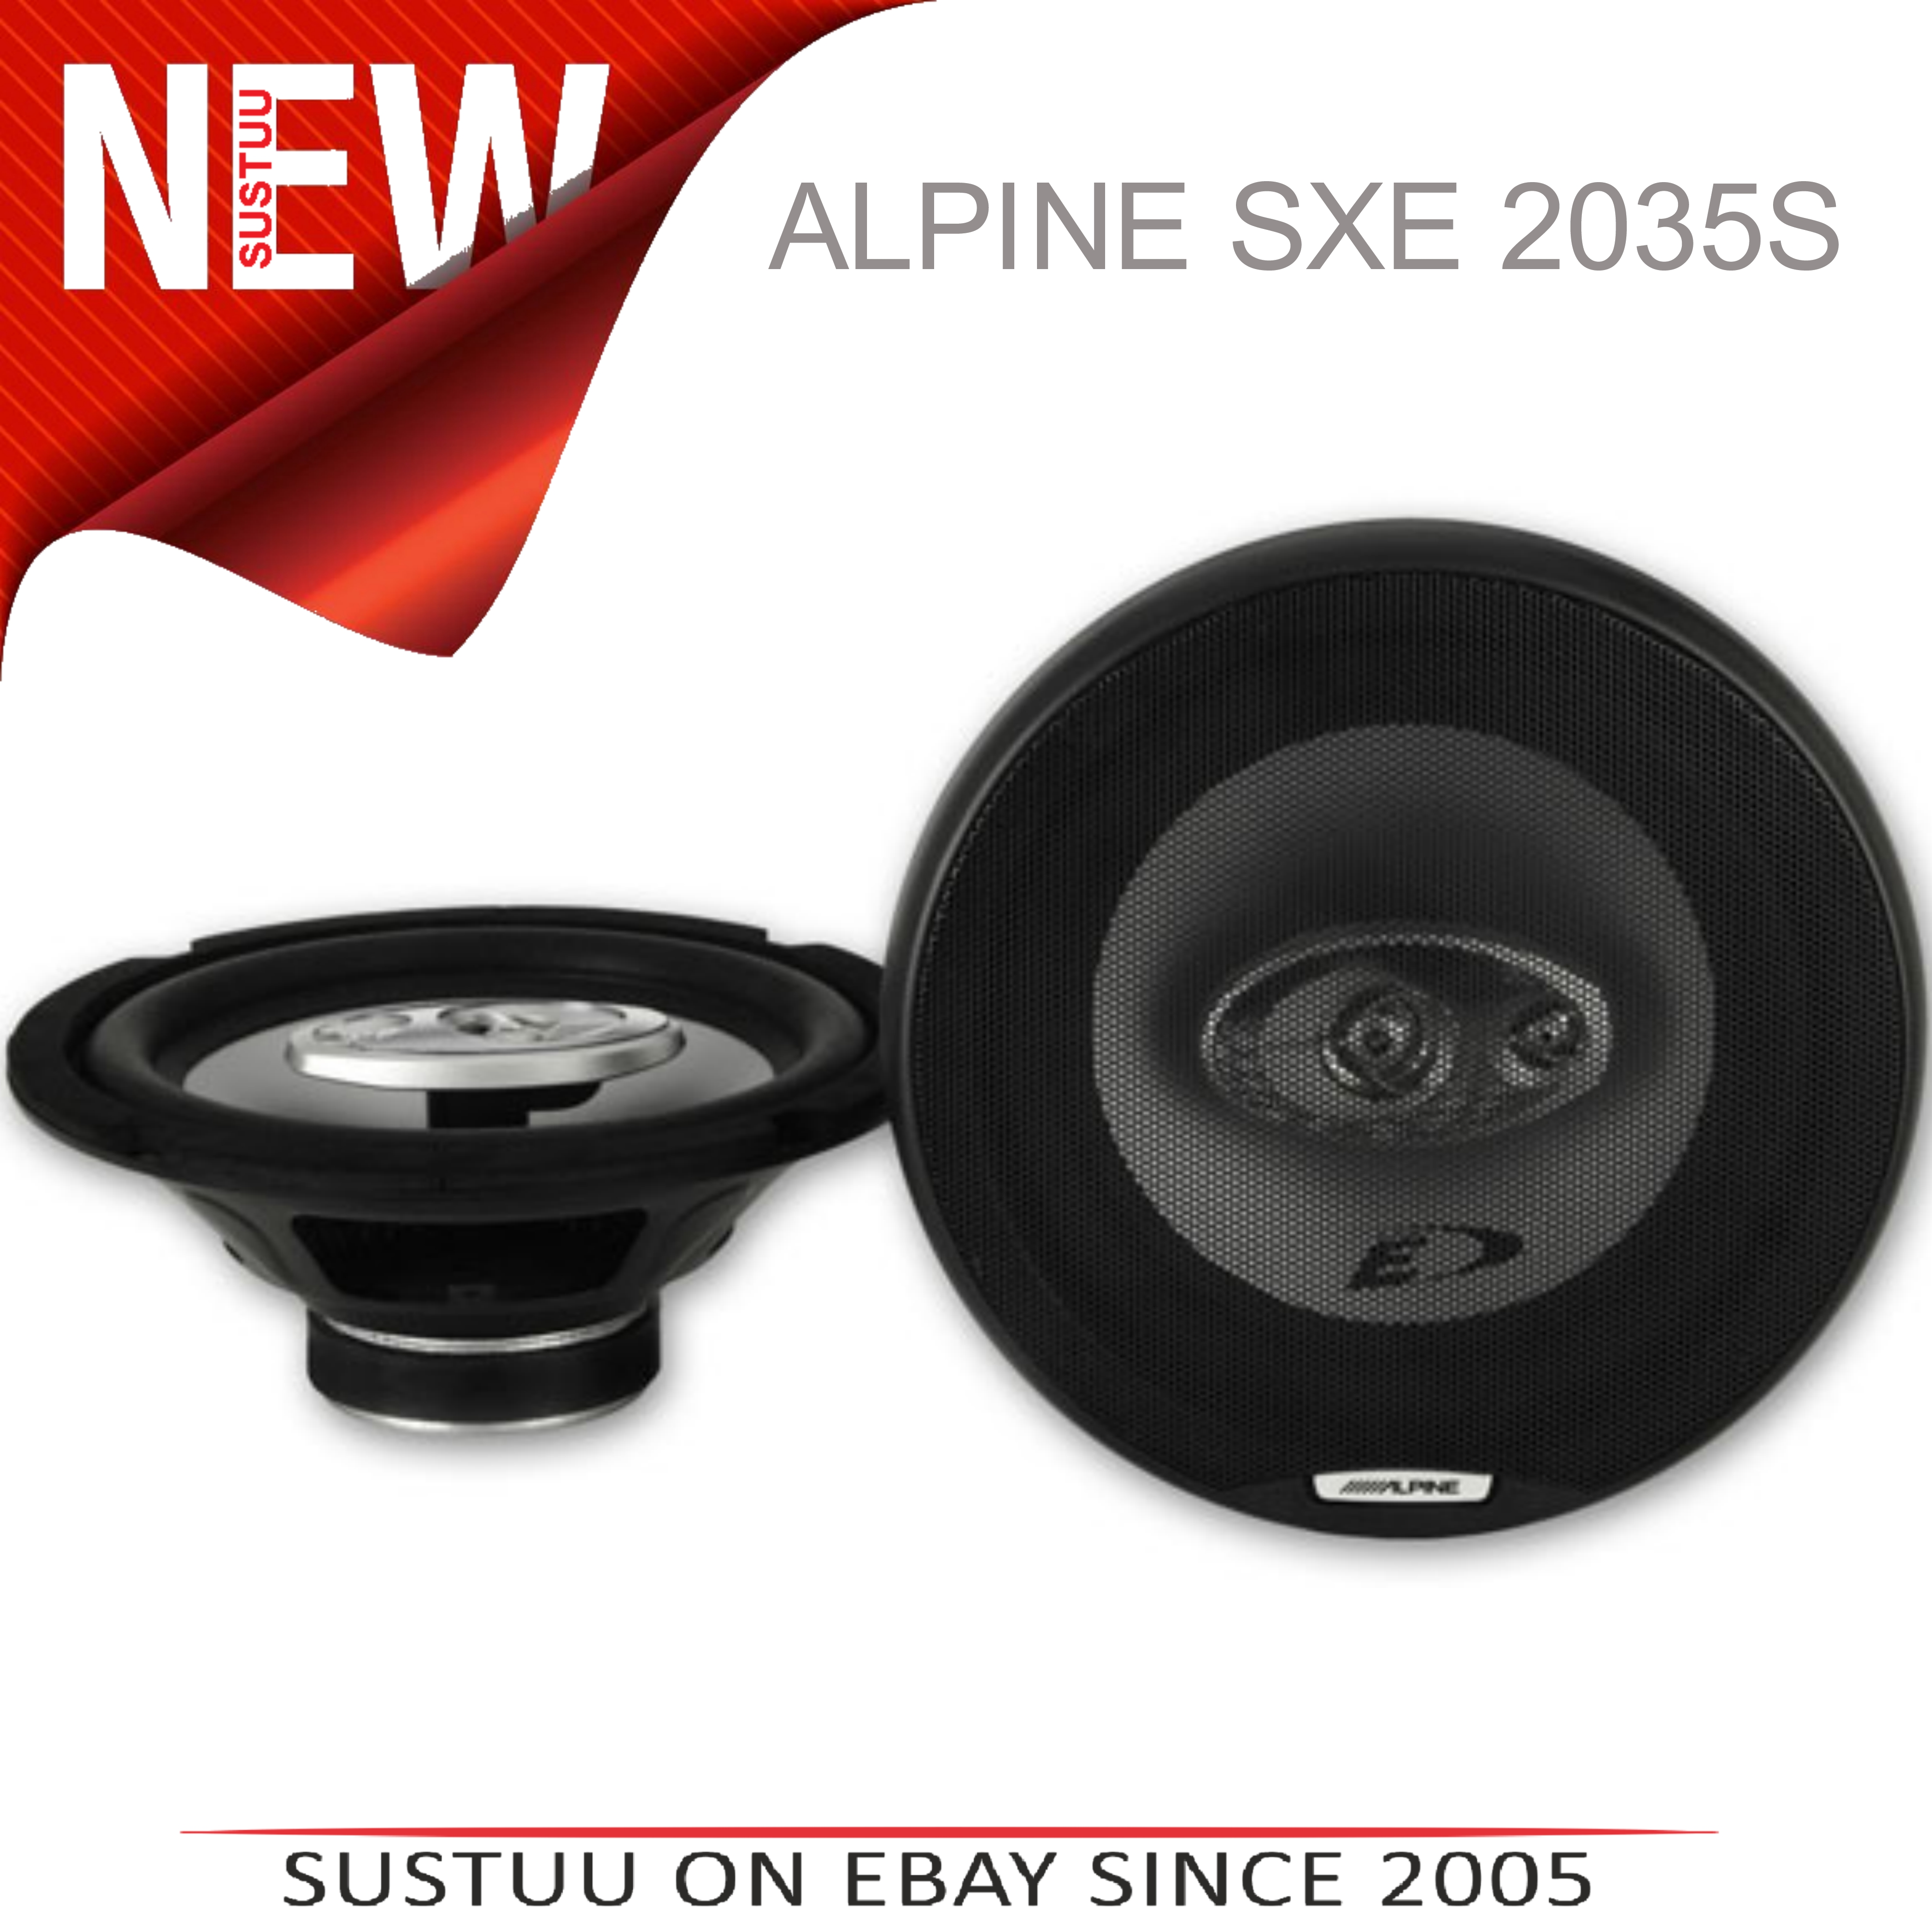 ALPINE SXE-2035E 20cm 3-Way 280W In Car Audio Vehicle Speakers